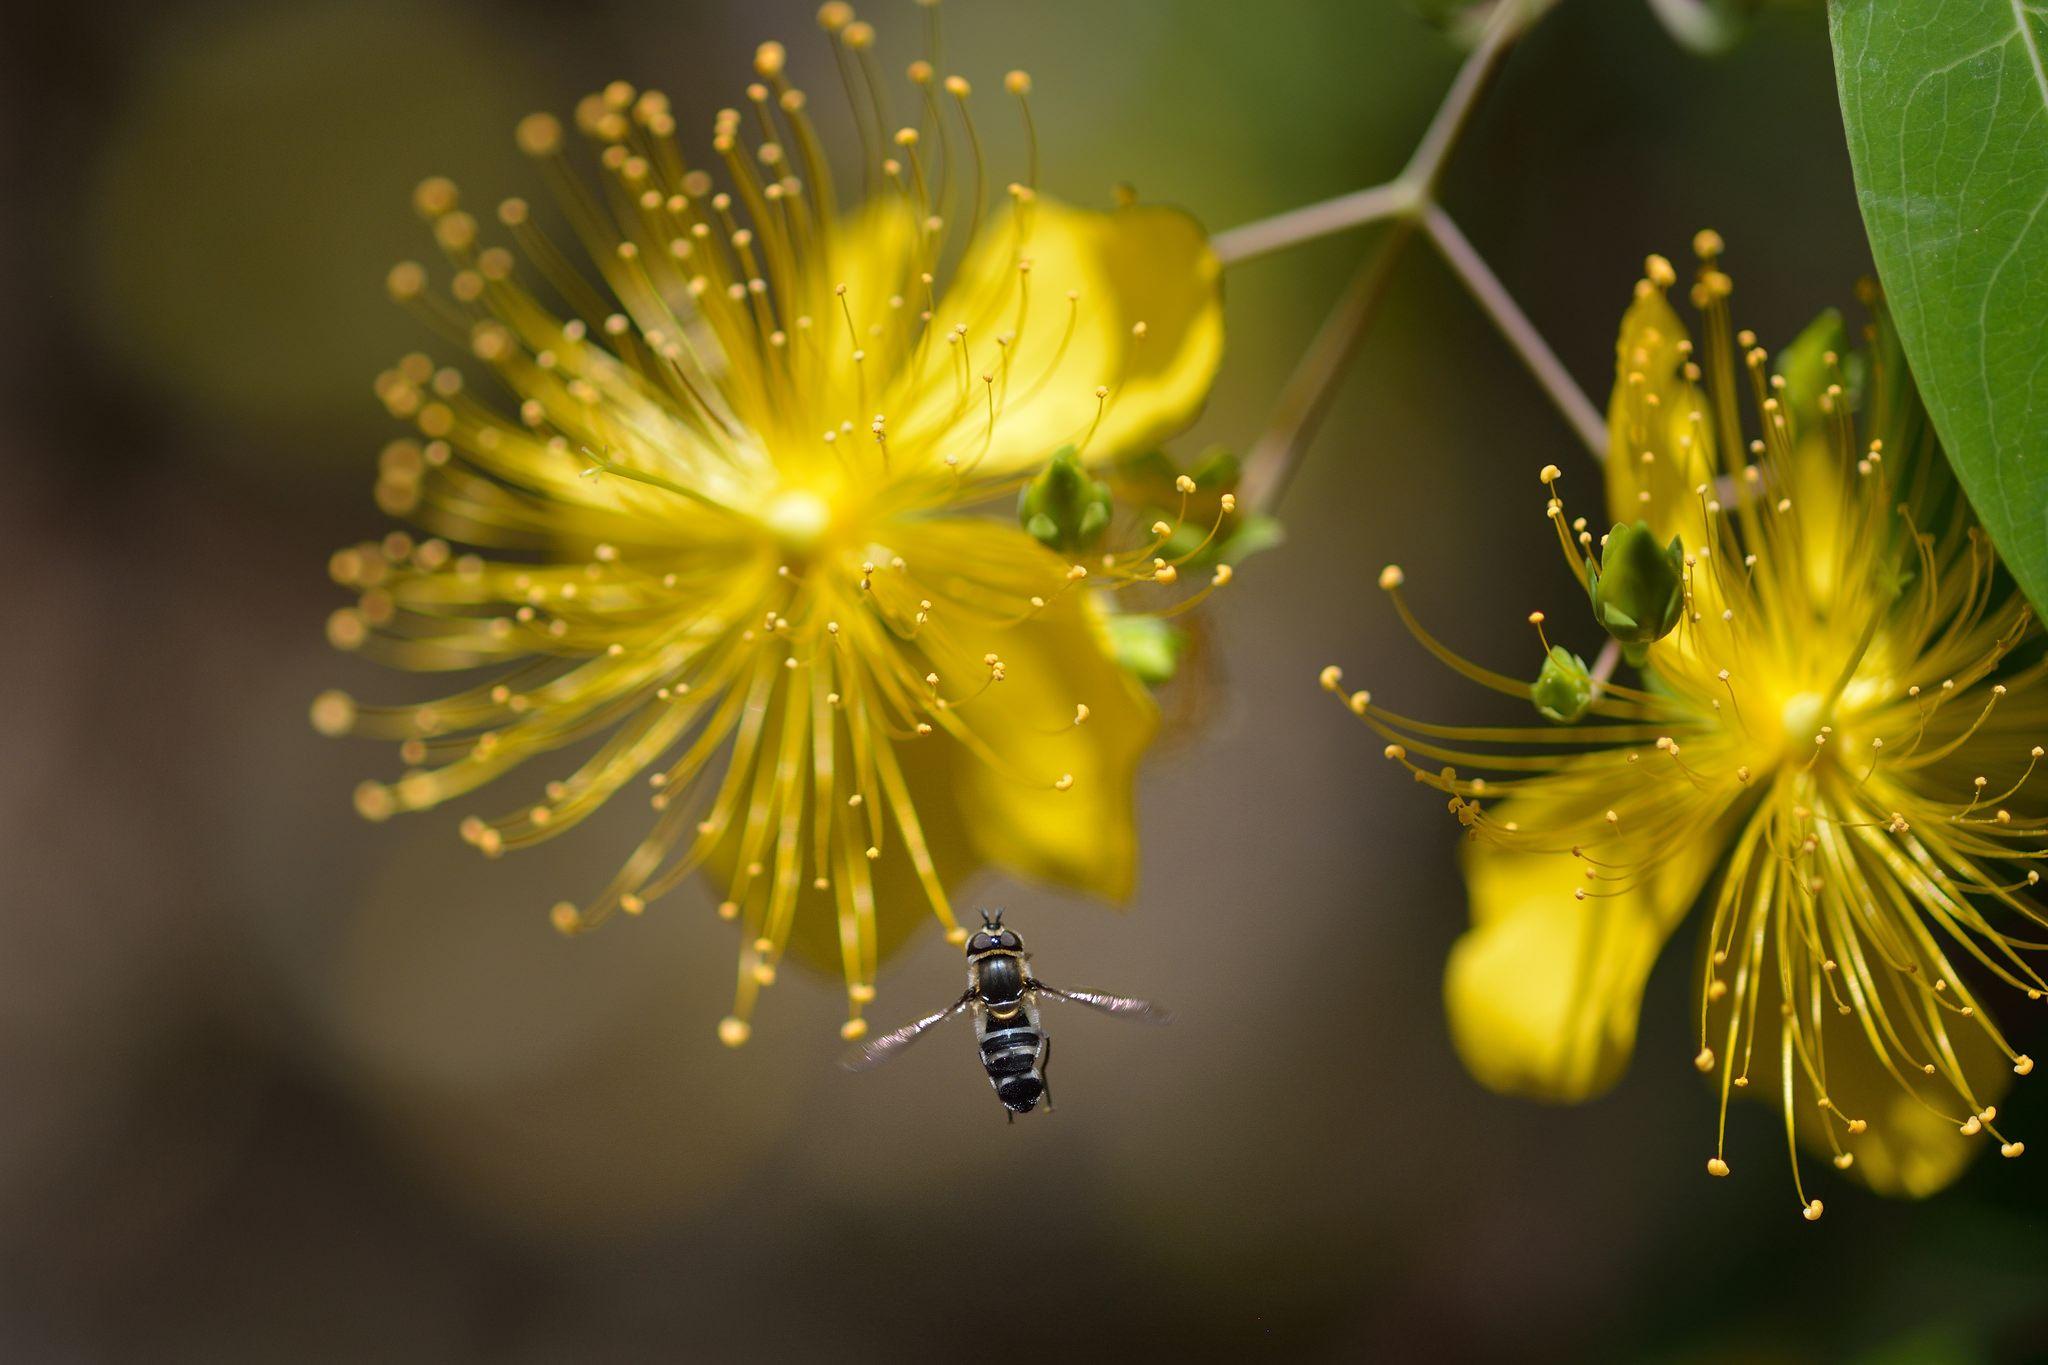 https://flic.kr/p/H1QRFU   ビヨウヤナギとクロヒラタアブ   ビヨウヤナギ(美容柳)        in my garden 学名 Hypericum monogynum  クロヒラタアブ Betasyrphus serarius